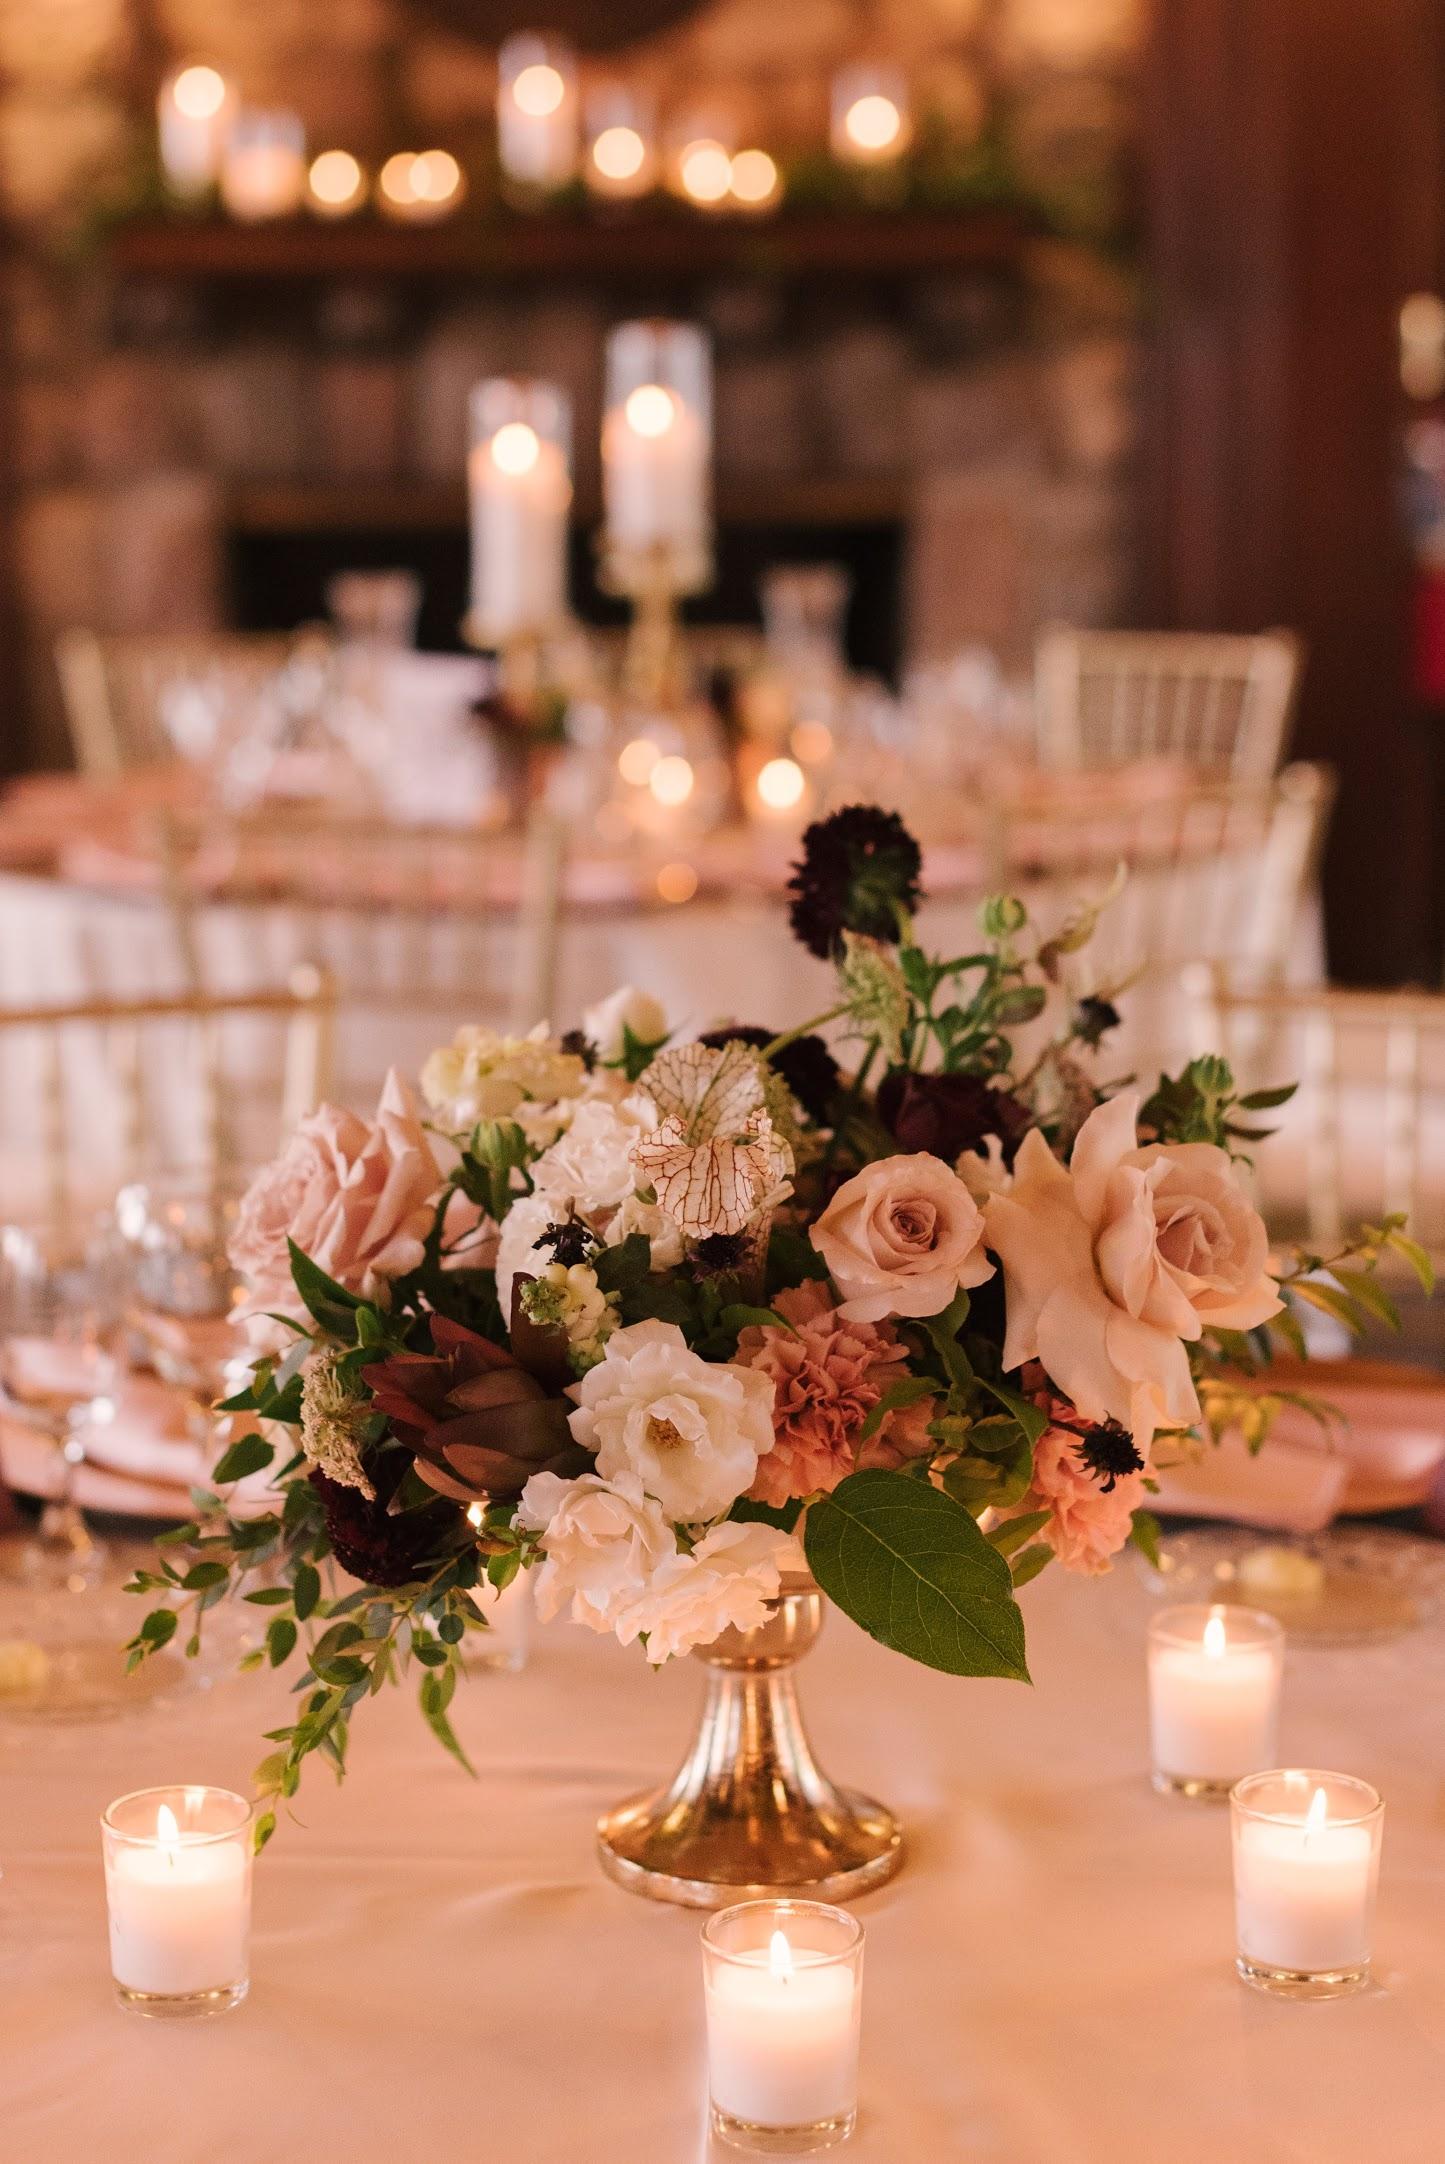 Field-Gems-Photography-Detroit-Michigan-Wedding-Photographer-Family-Photographer-Photobooth-090818-886.jpg